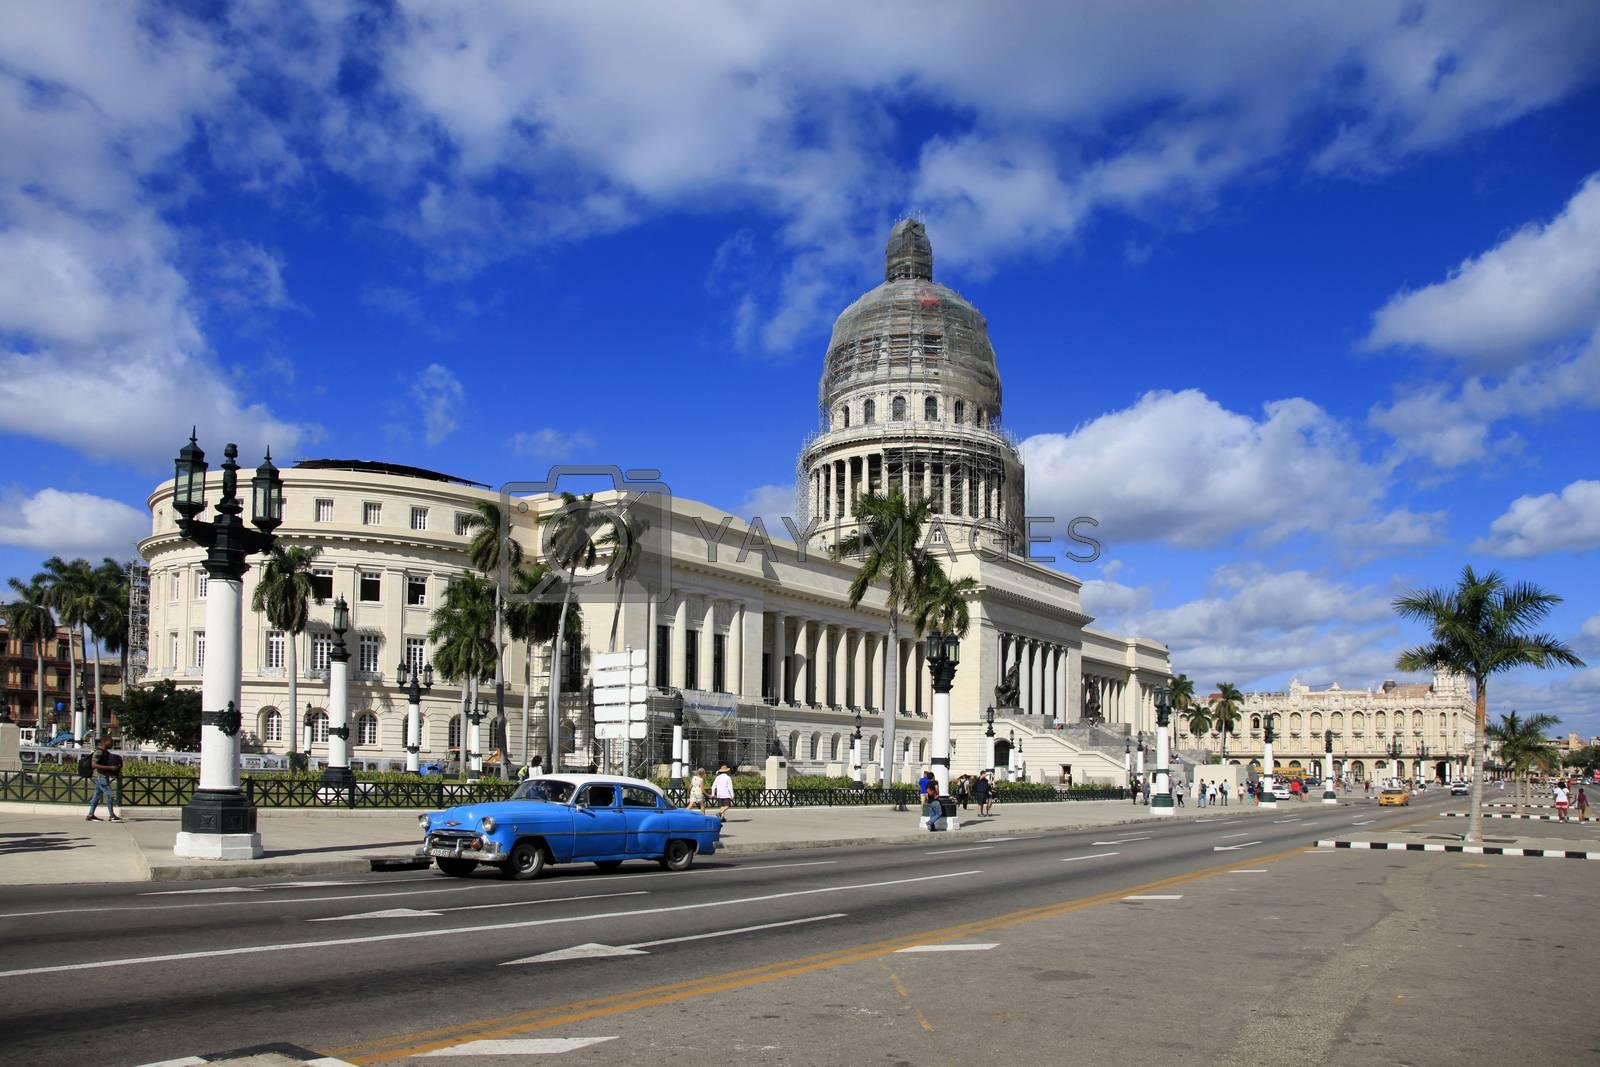 Havana, Сuba - January 10, 2019: Avenue in front of the Capitol of Old Havana. Cuba